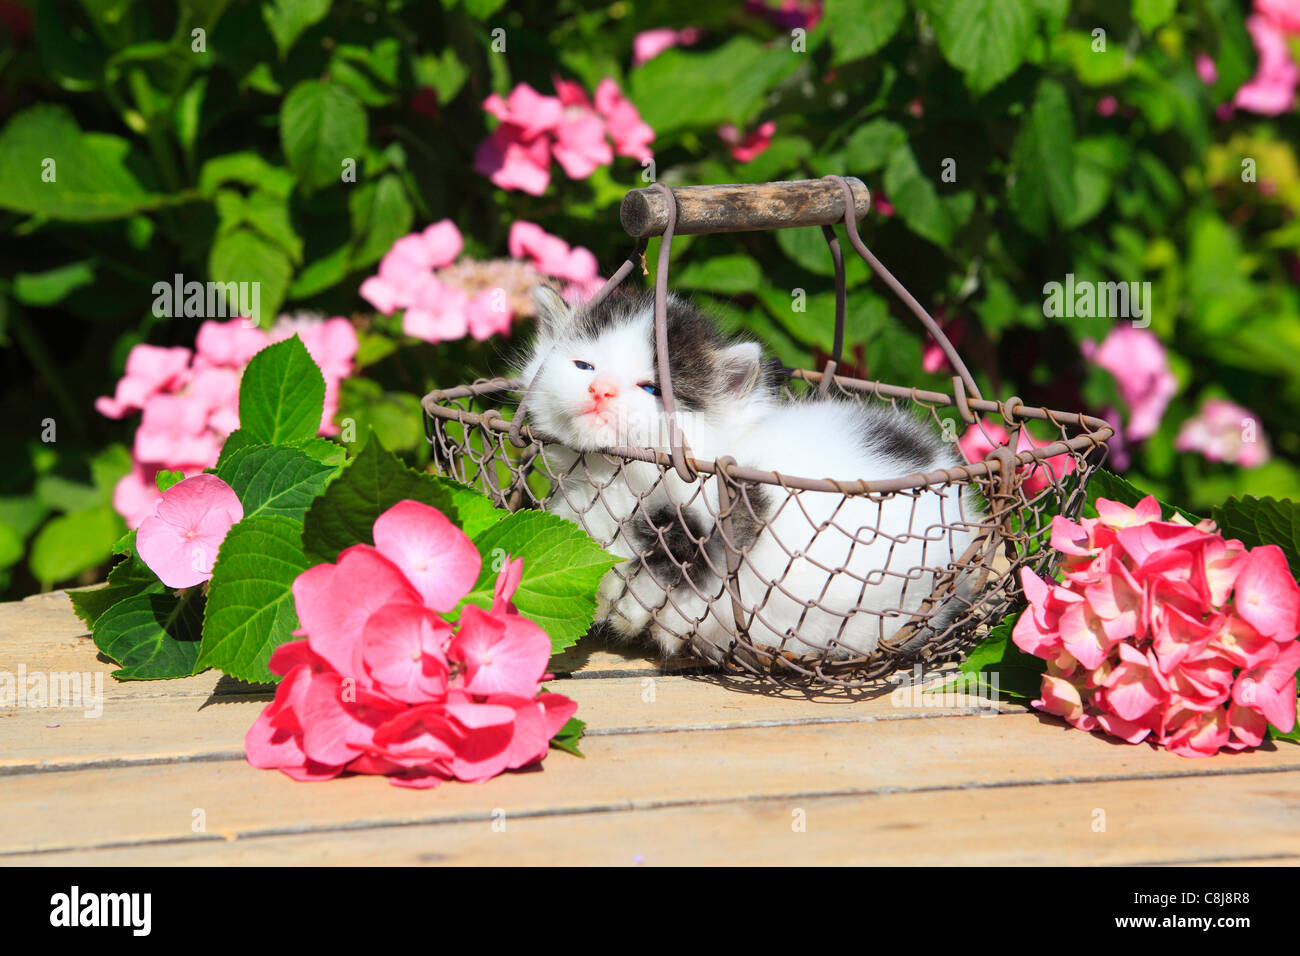 3 weeks, flower, flowers, garden, house, home, Animal, domestic animal, pet, young, cat, basket, kitten, baskets, - Stock Image